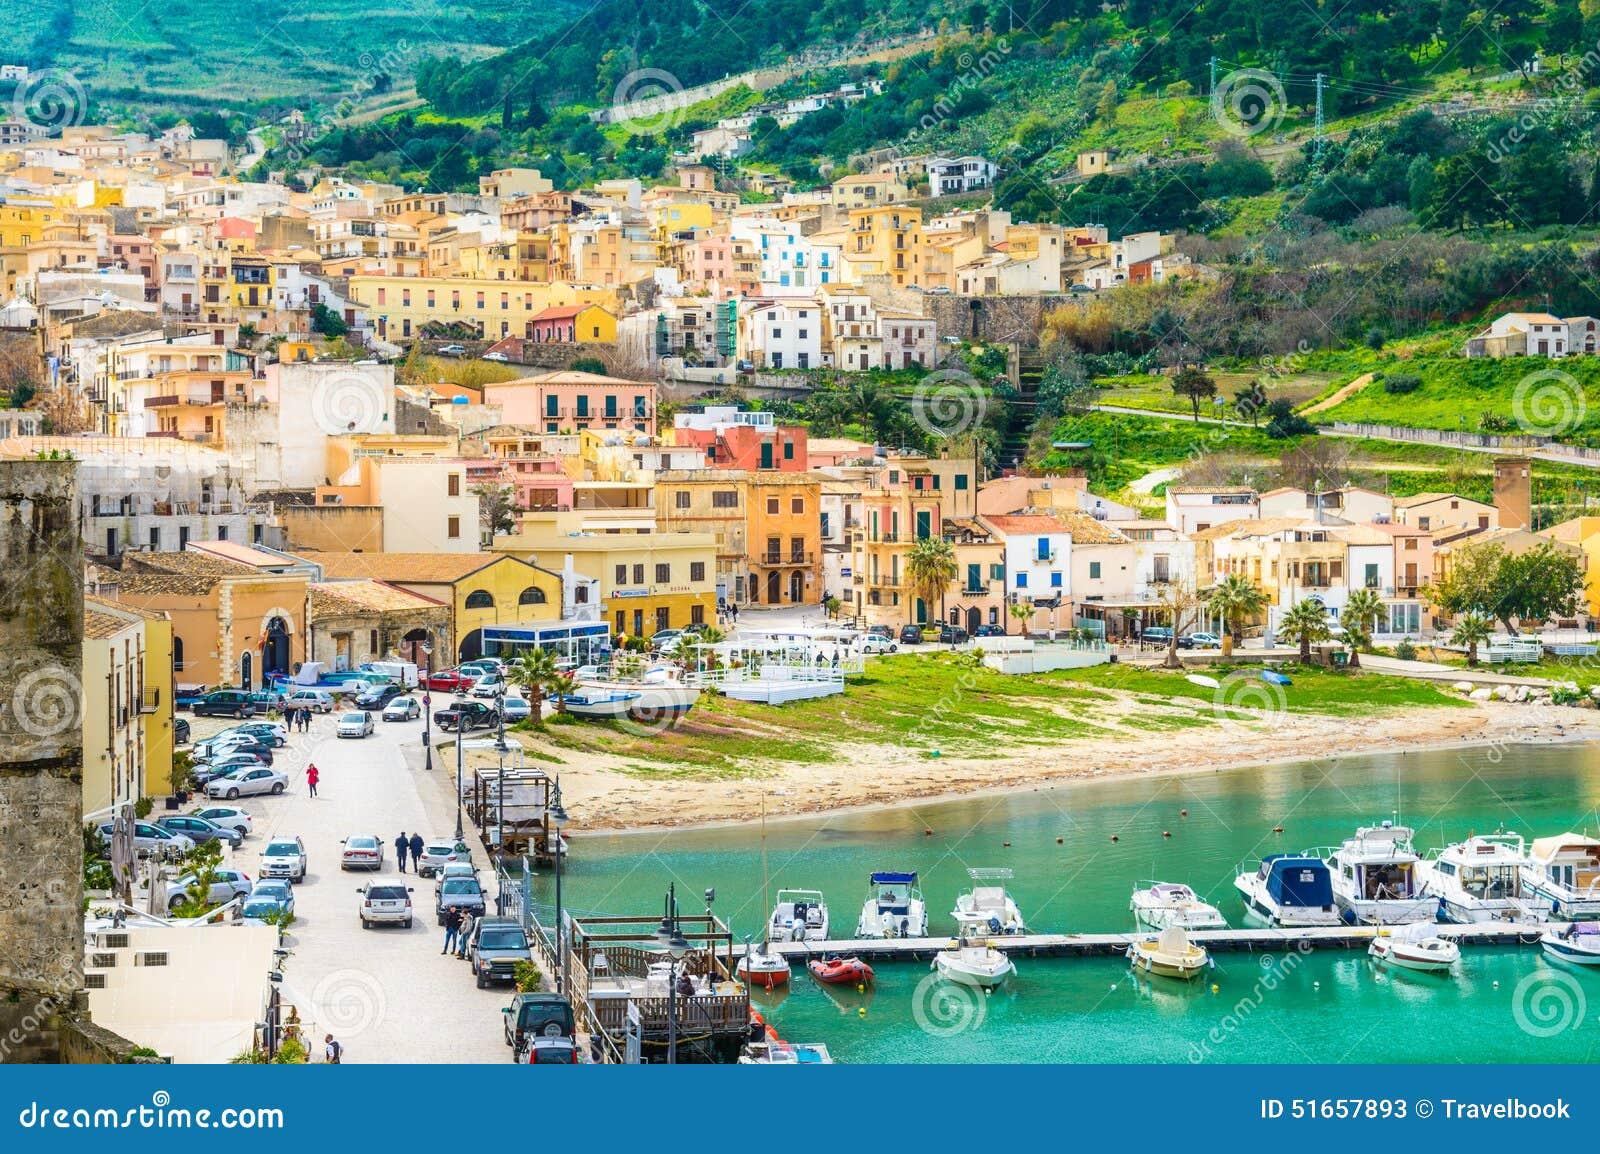 Castellammare del golfo sicily italy stock photo image 48782909 - Castellammare Del Golfo Village Panoramic View Trapani Sicily Stock Photos